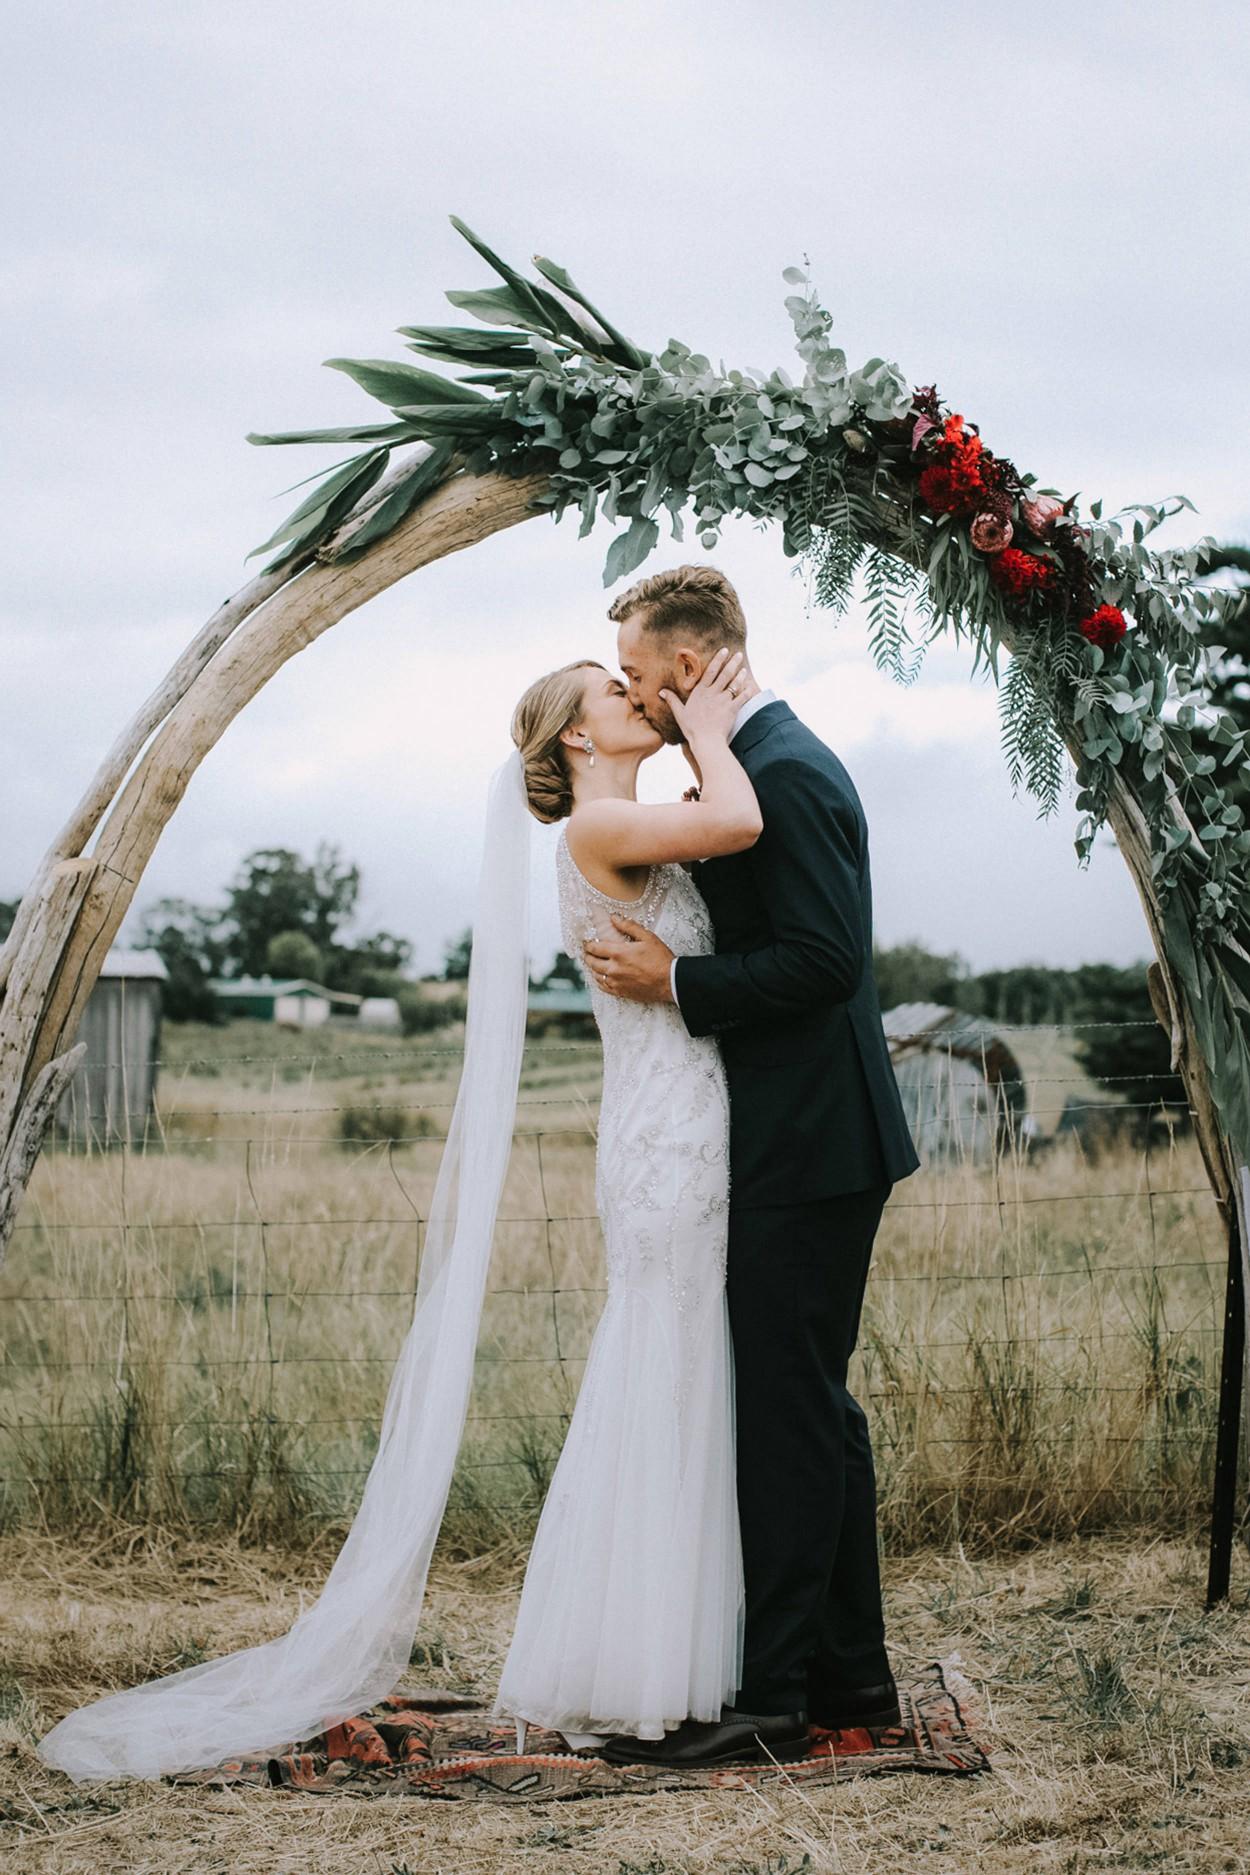 I-Got-You-Babe-&-Co.-Wedding-Photographers-Cassie019.jpg